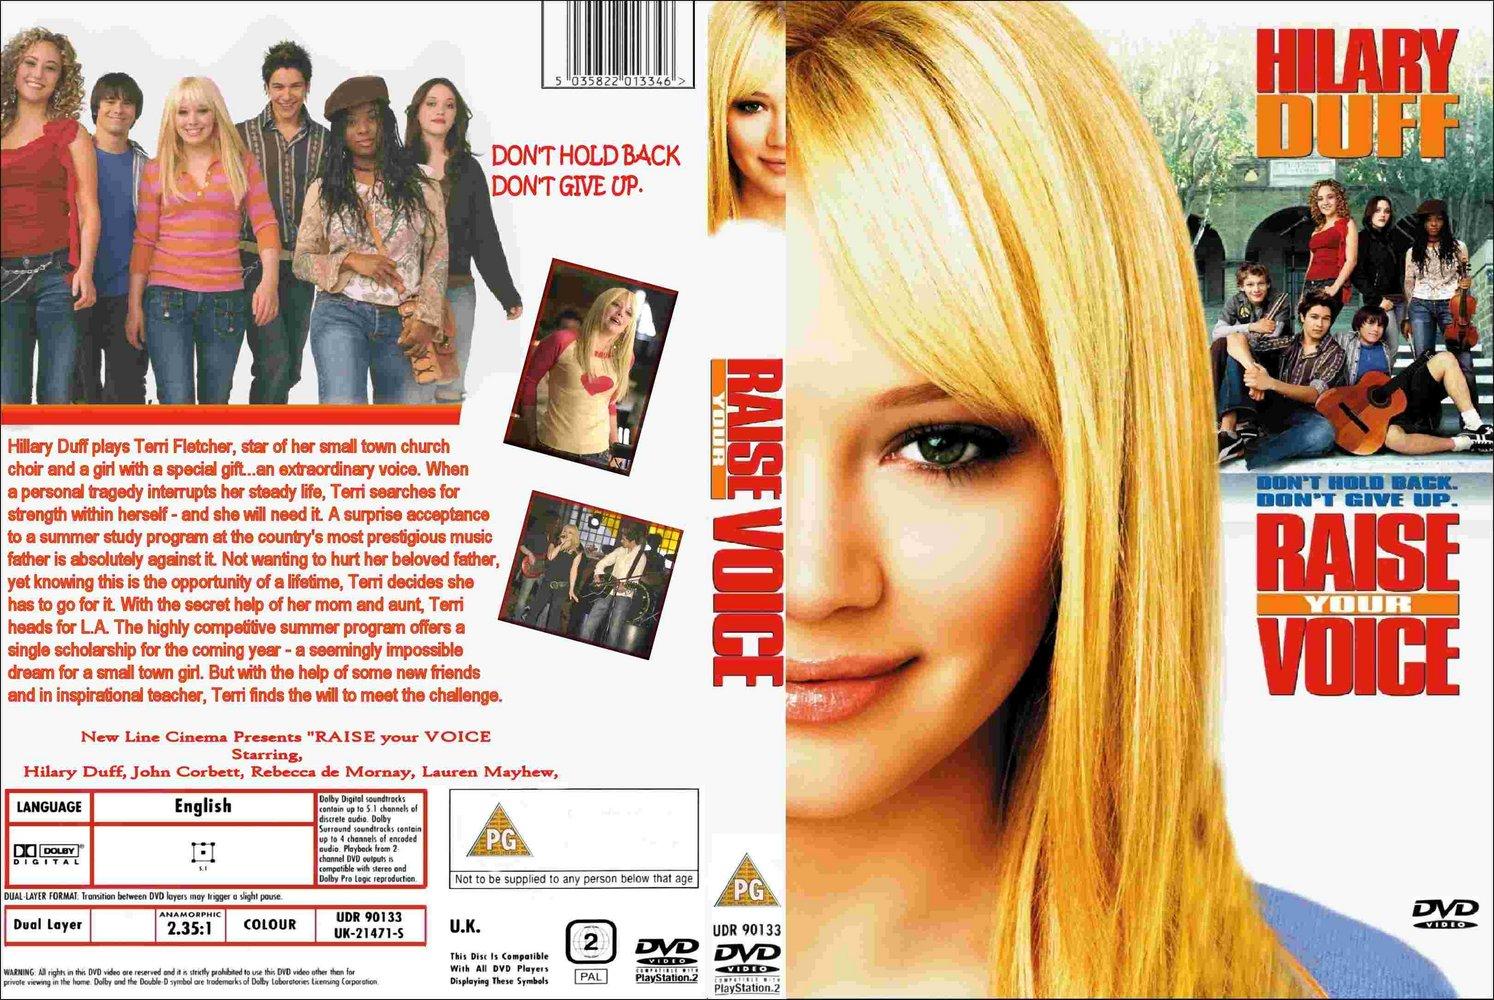 Hilary Duff - Three Days Grace ...